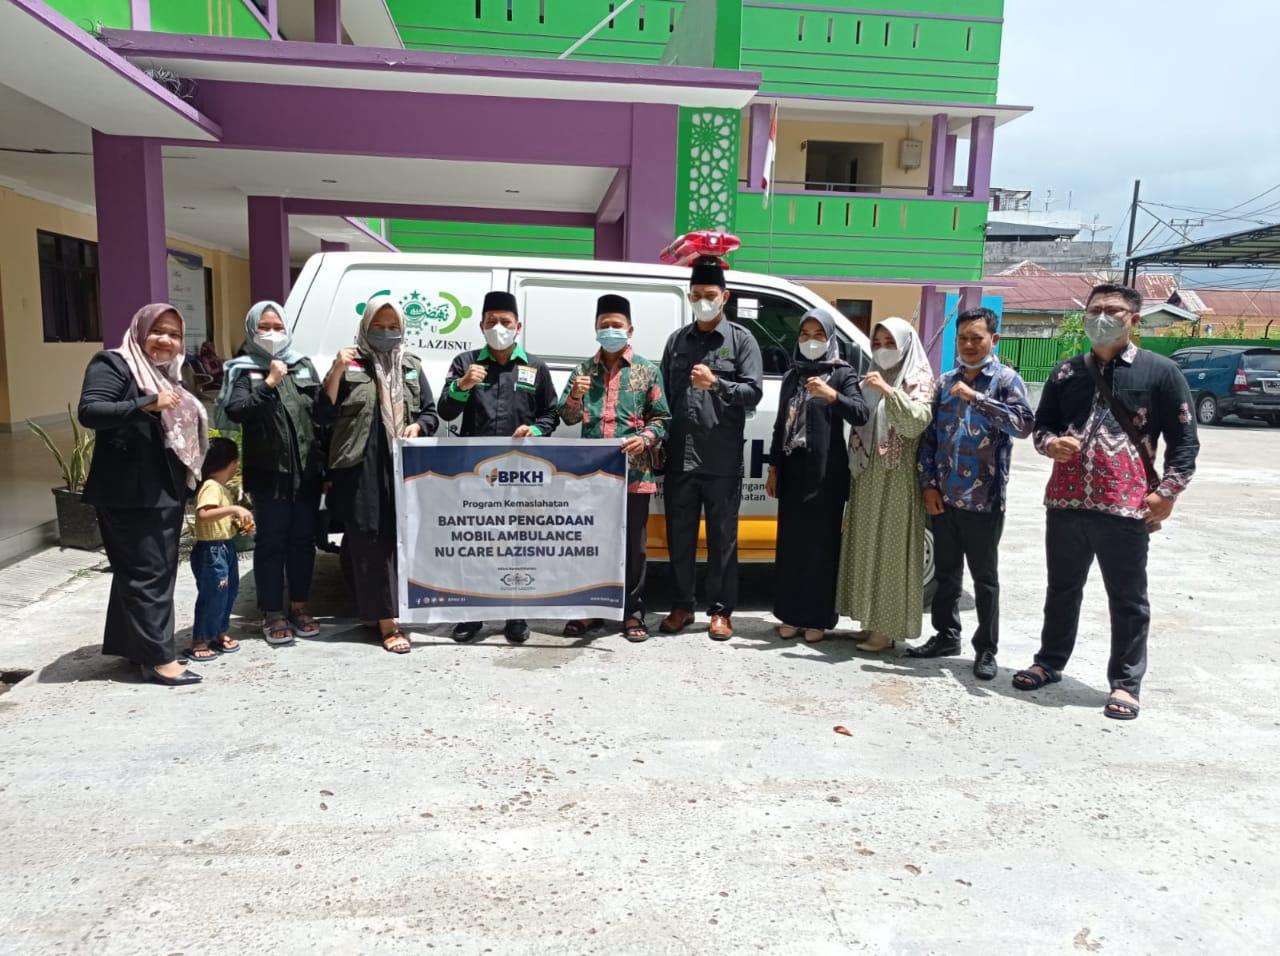 Bantuan 1 Mobil Ambulance kepada NUCARE - LAZISNU Provinsi Jambi